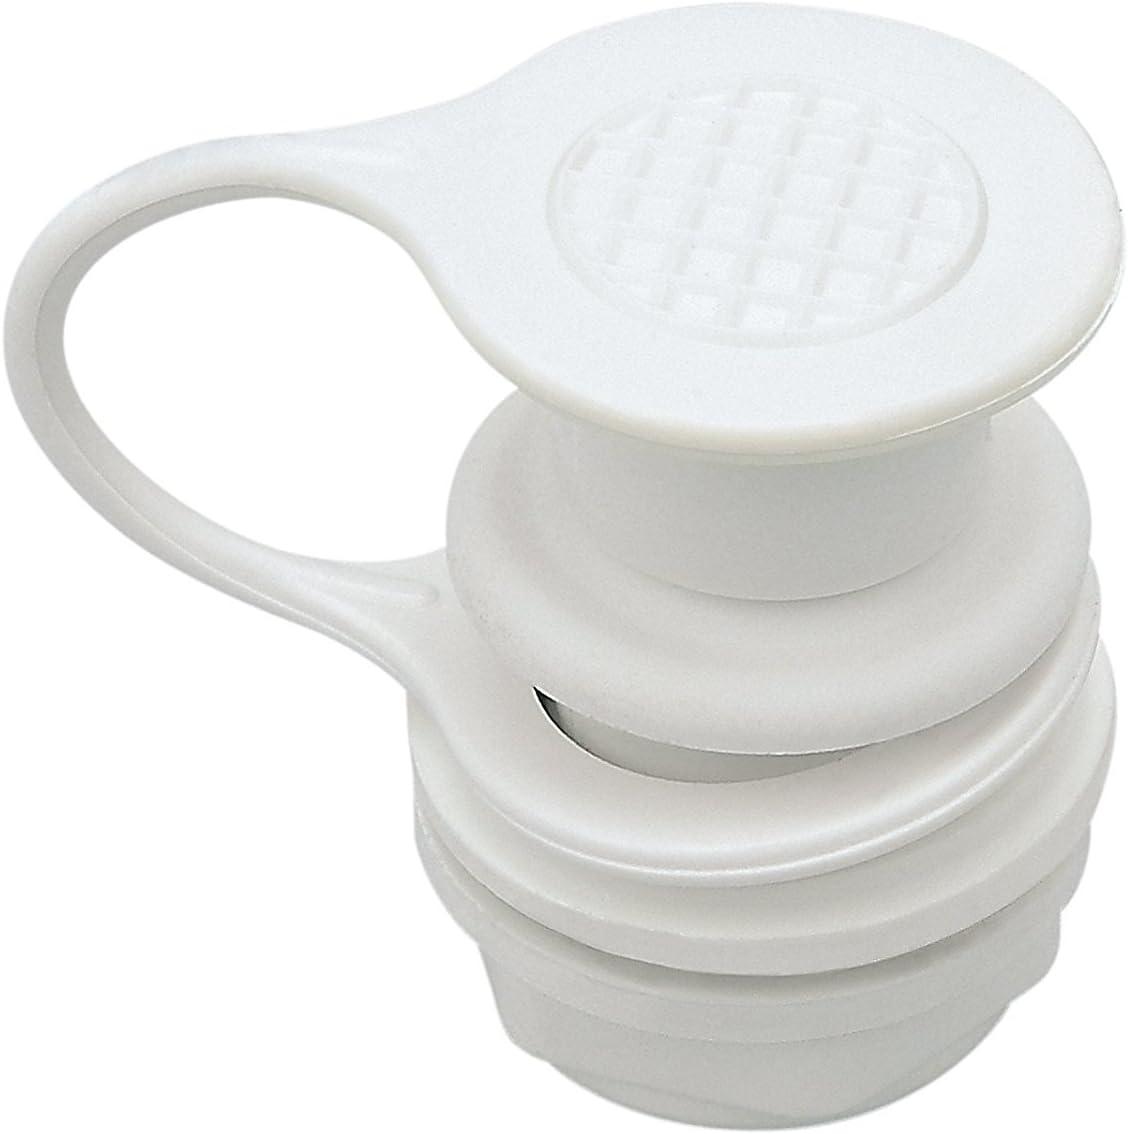 Igloo24010Standard Drain Plug-REPLACEMENT DRAIN PLUG